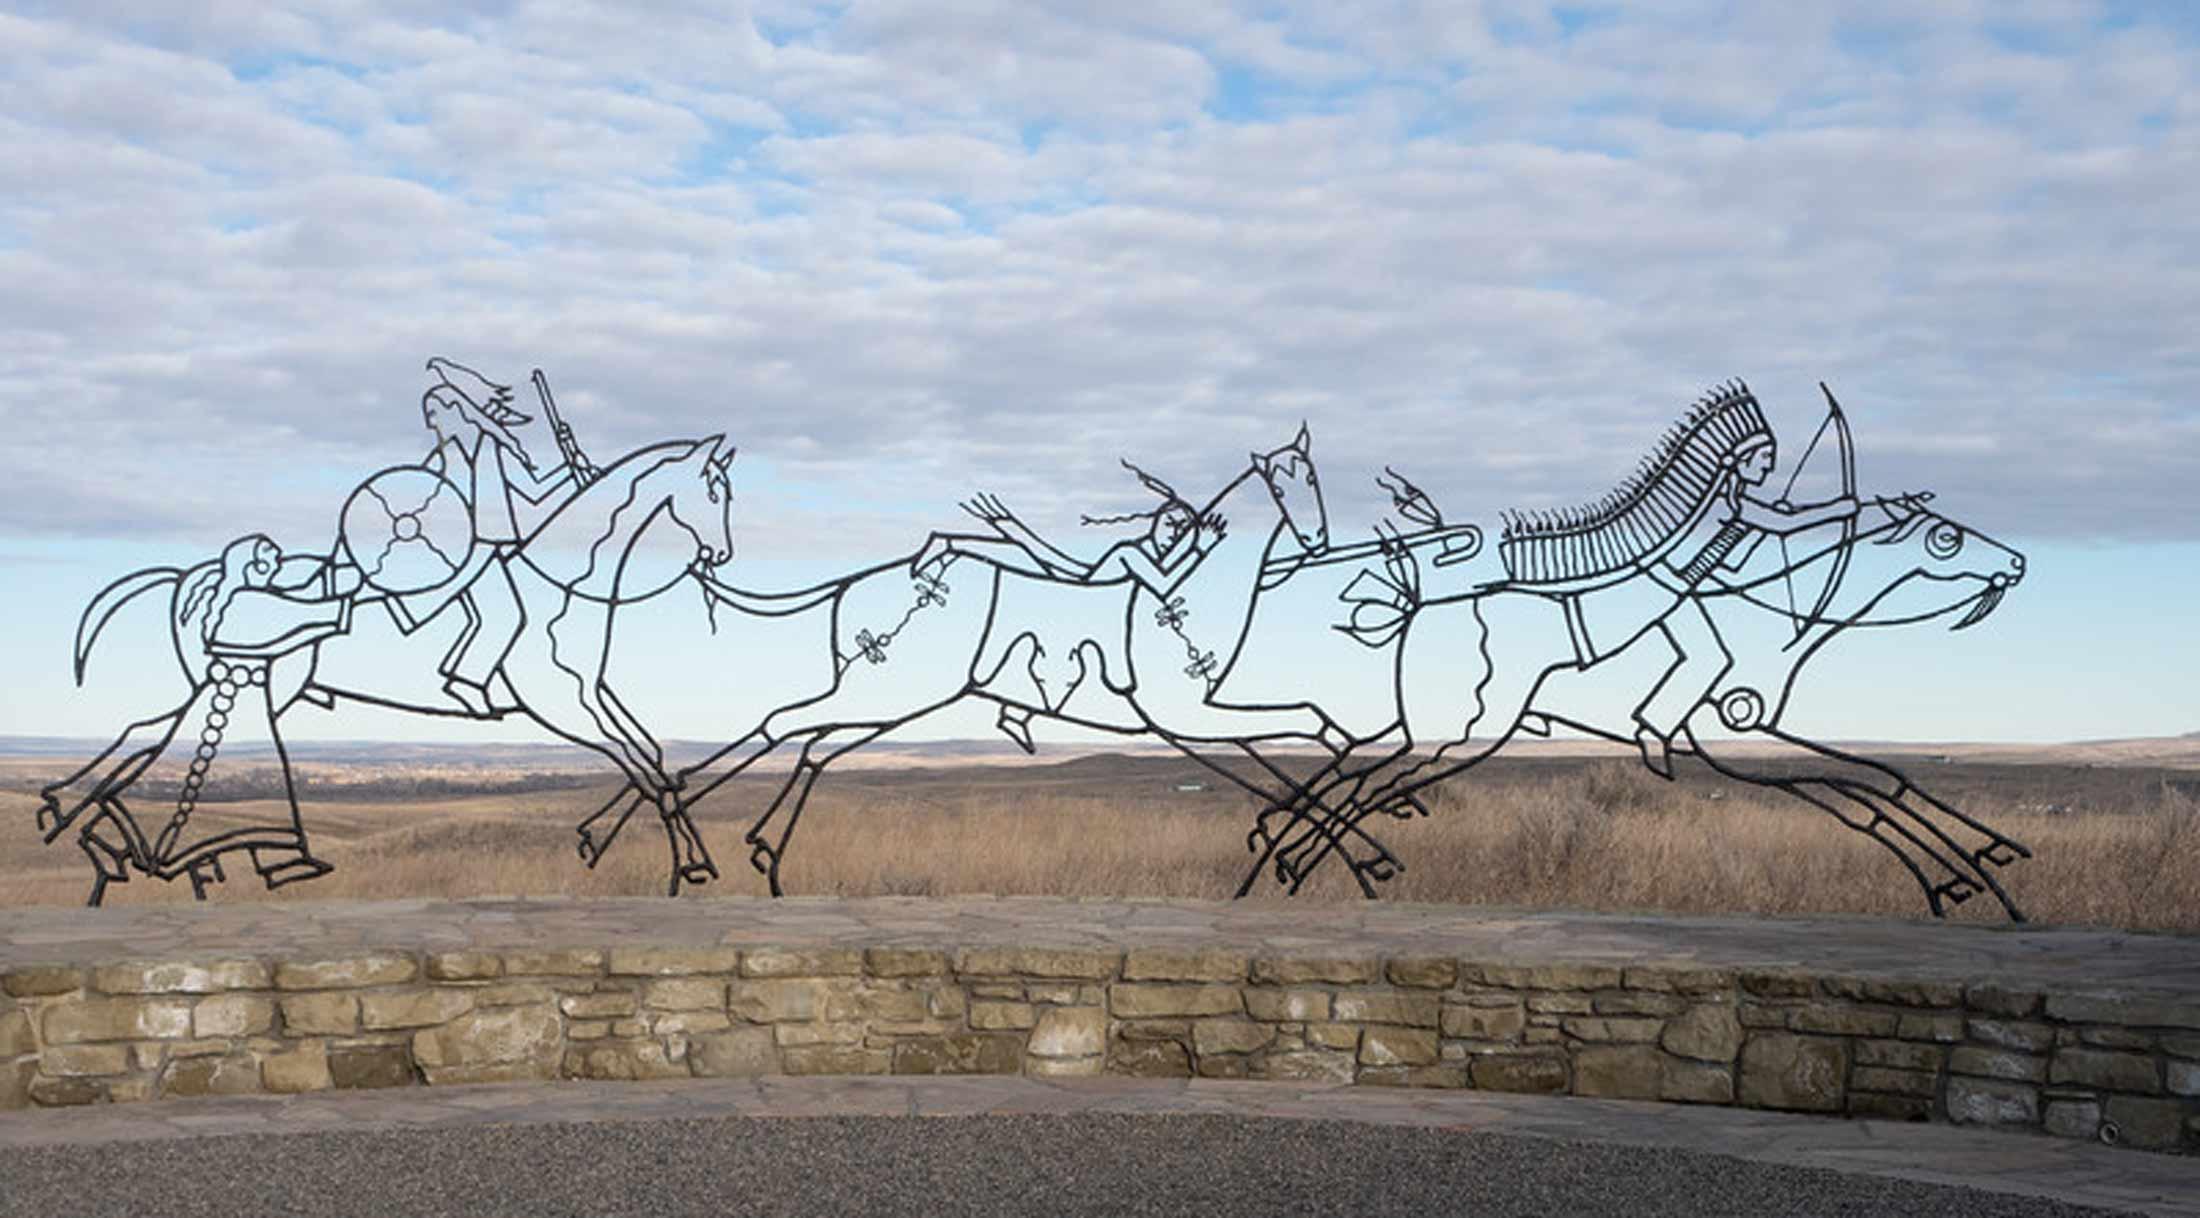 Visit Little Bighorn on a Montana Road Trip